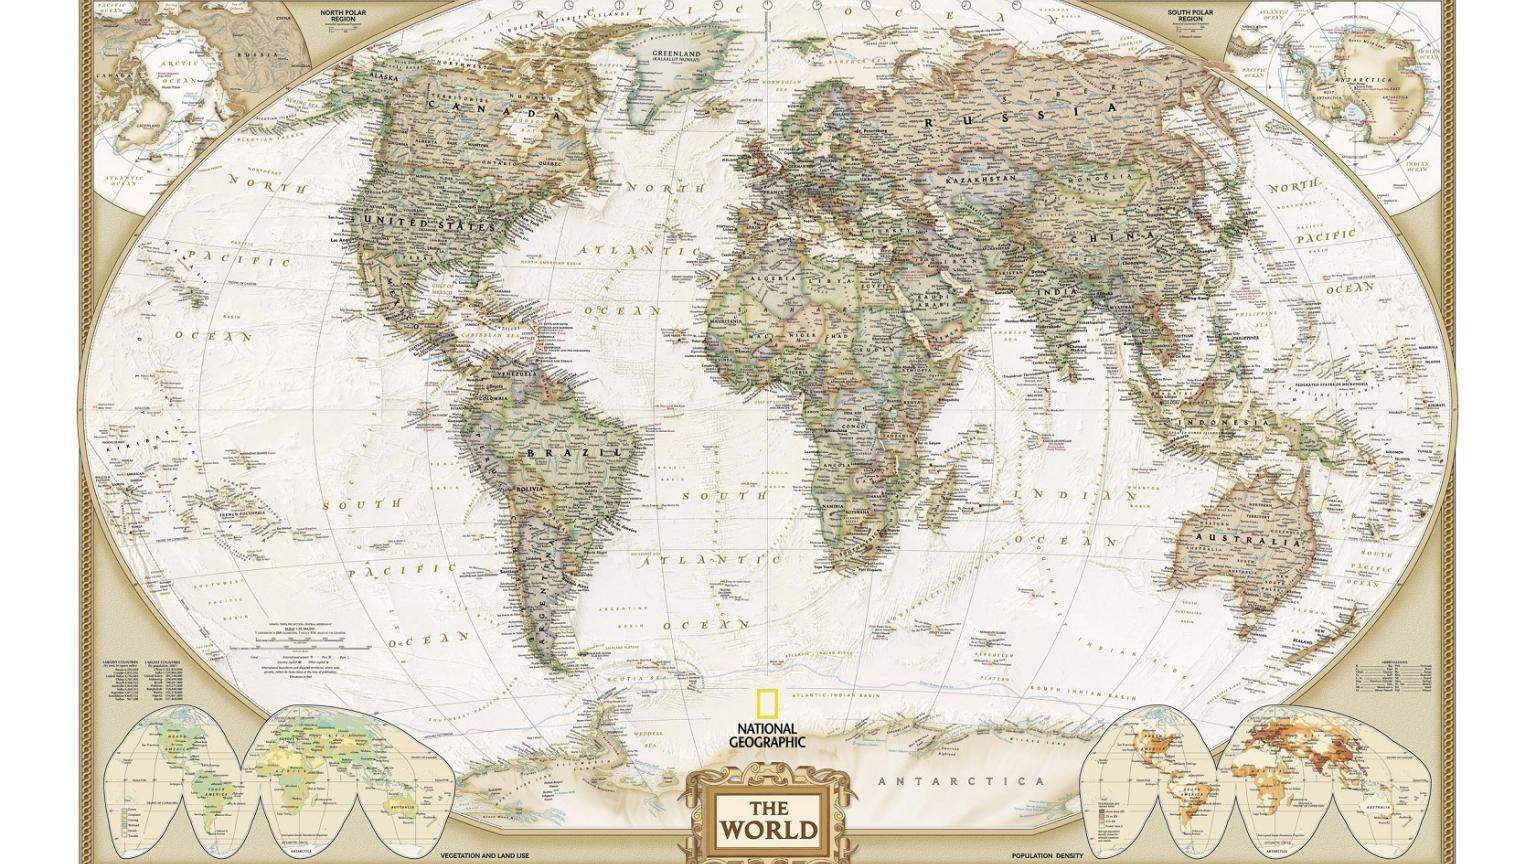 Free Download Wallpaper Travel Wallpaper World Map Wallpaper